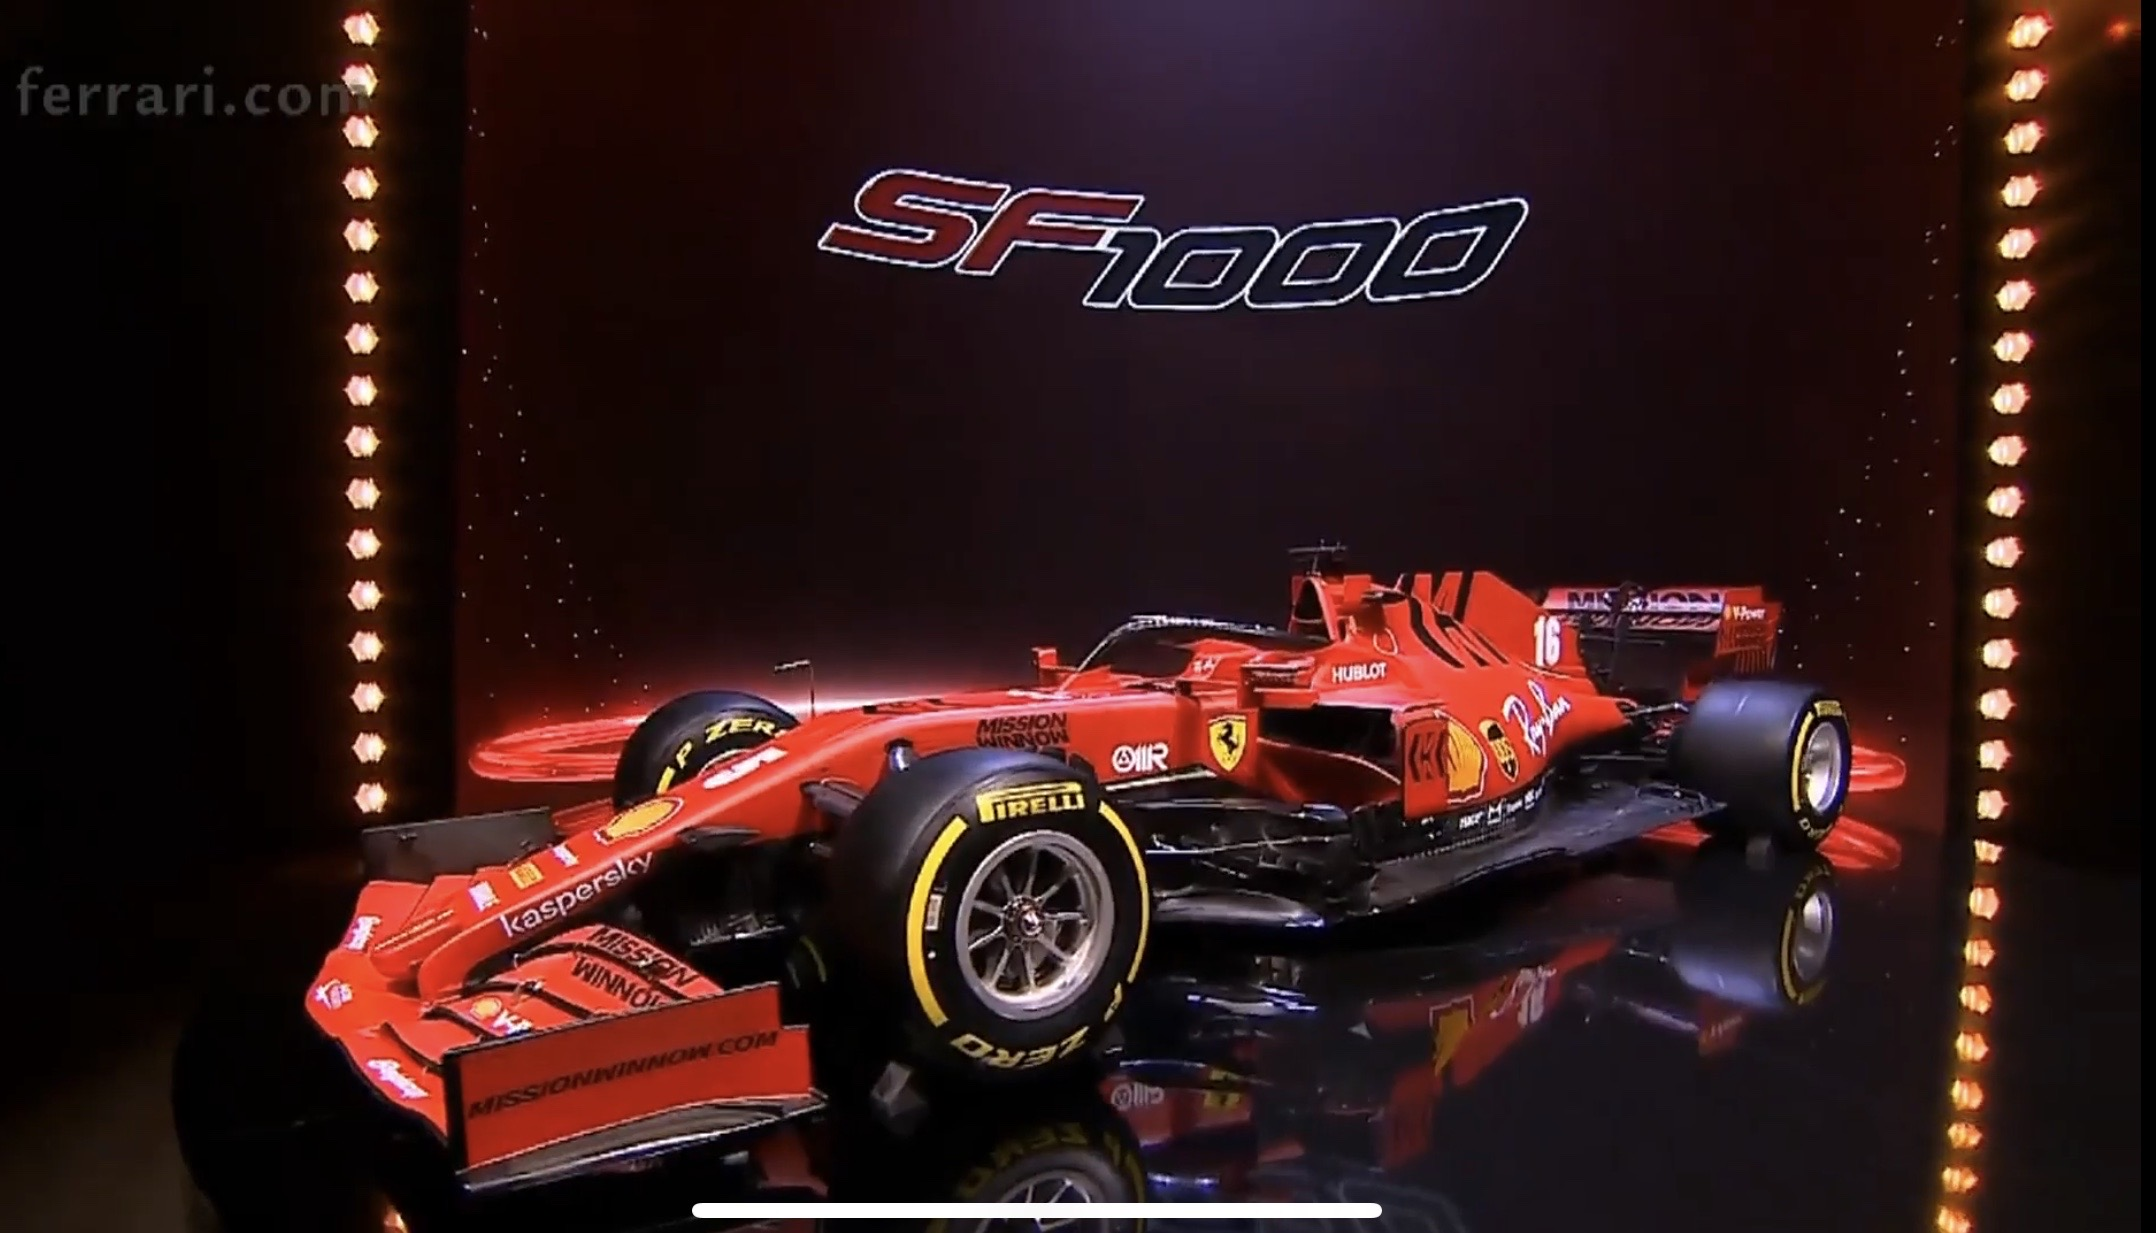 Ferrari presenta el SF1000, su nuevo monoplaza